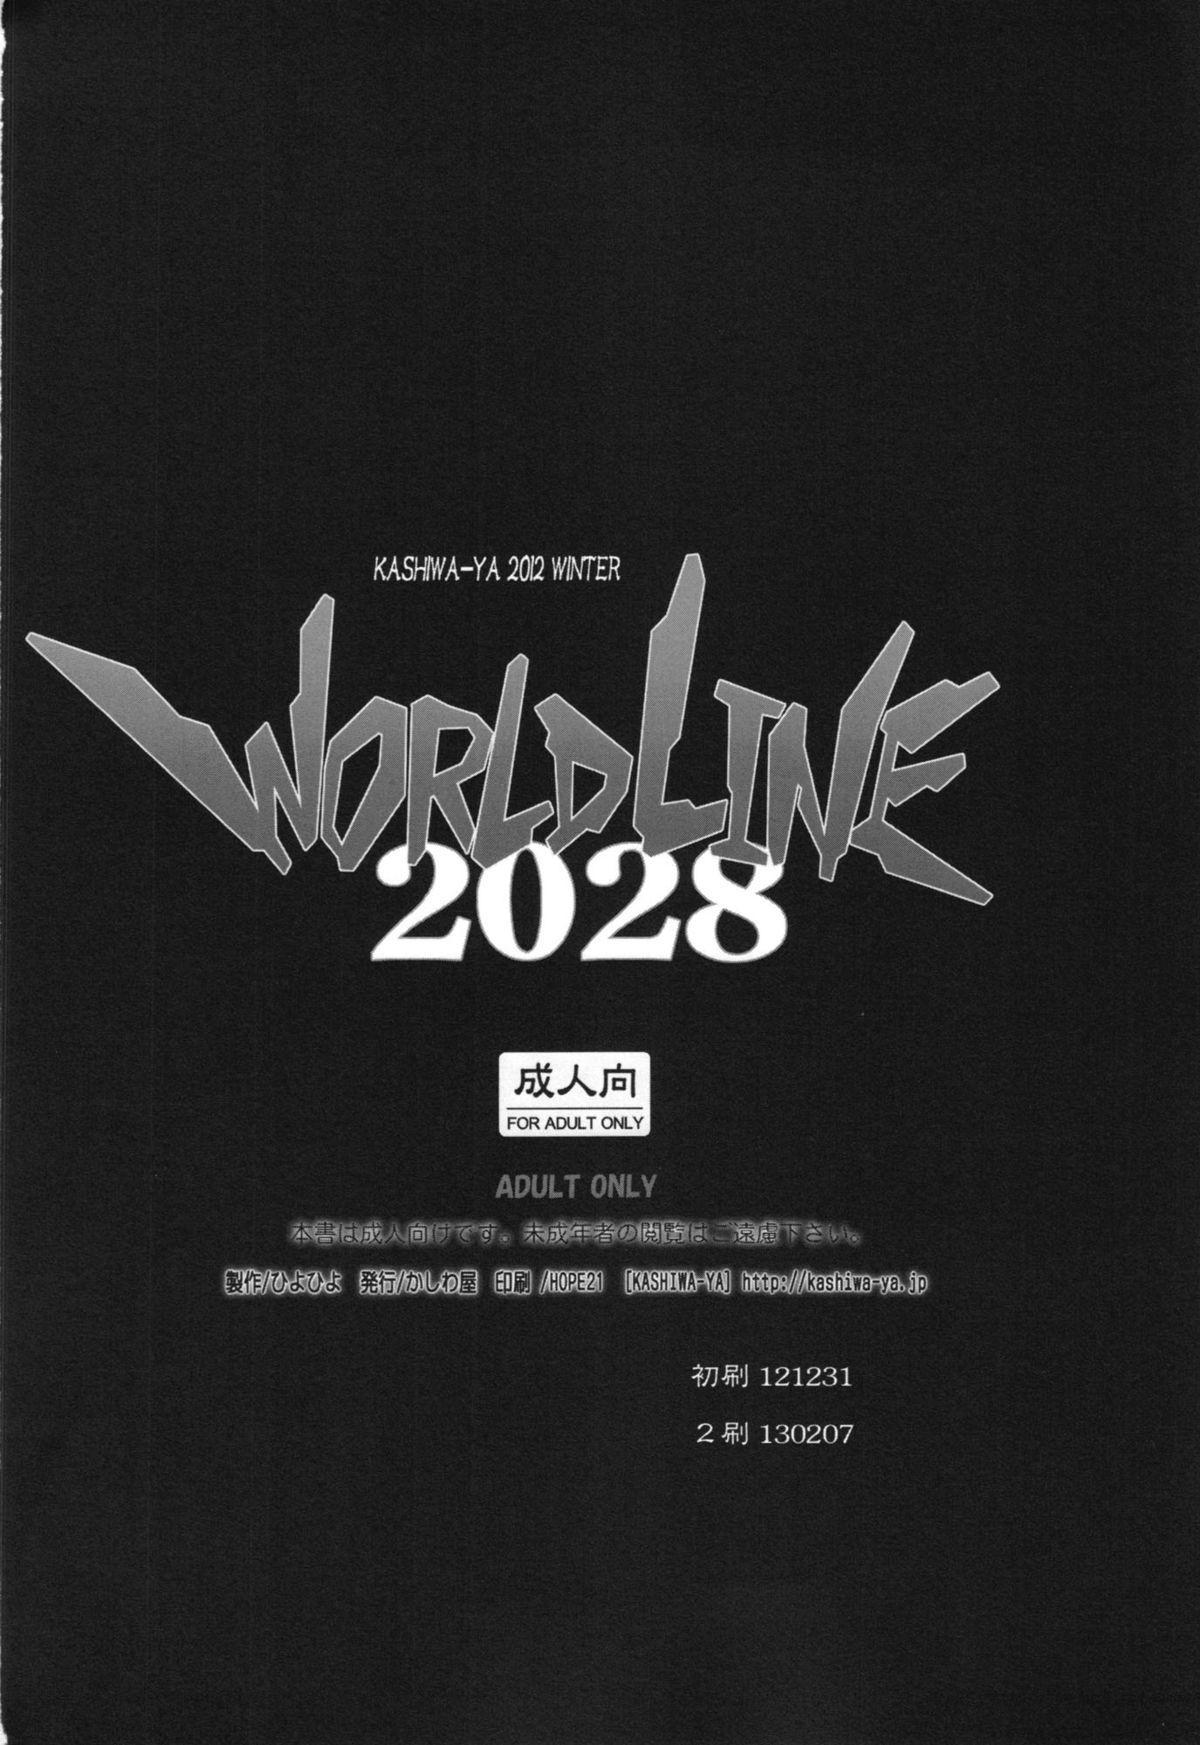 WORLD LINE 2028 19